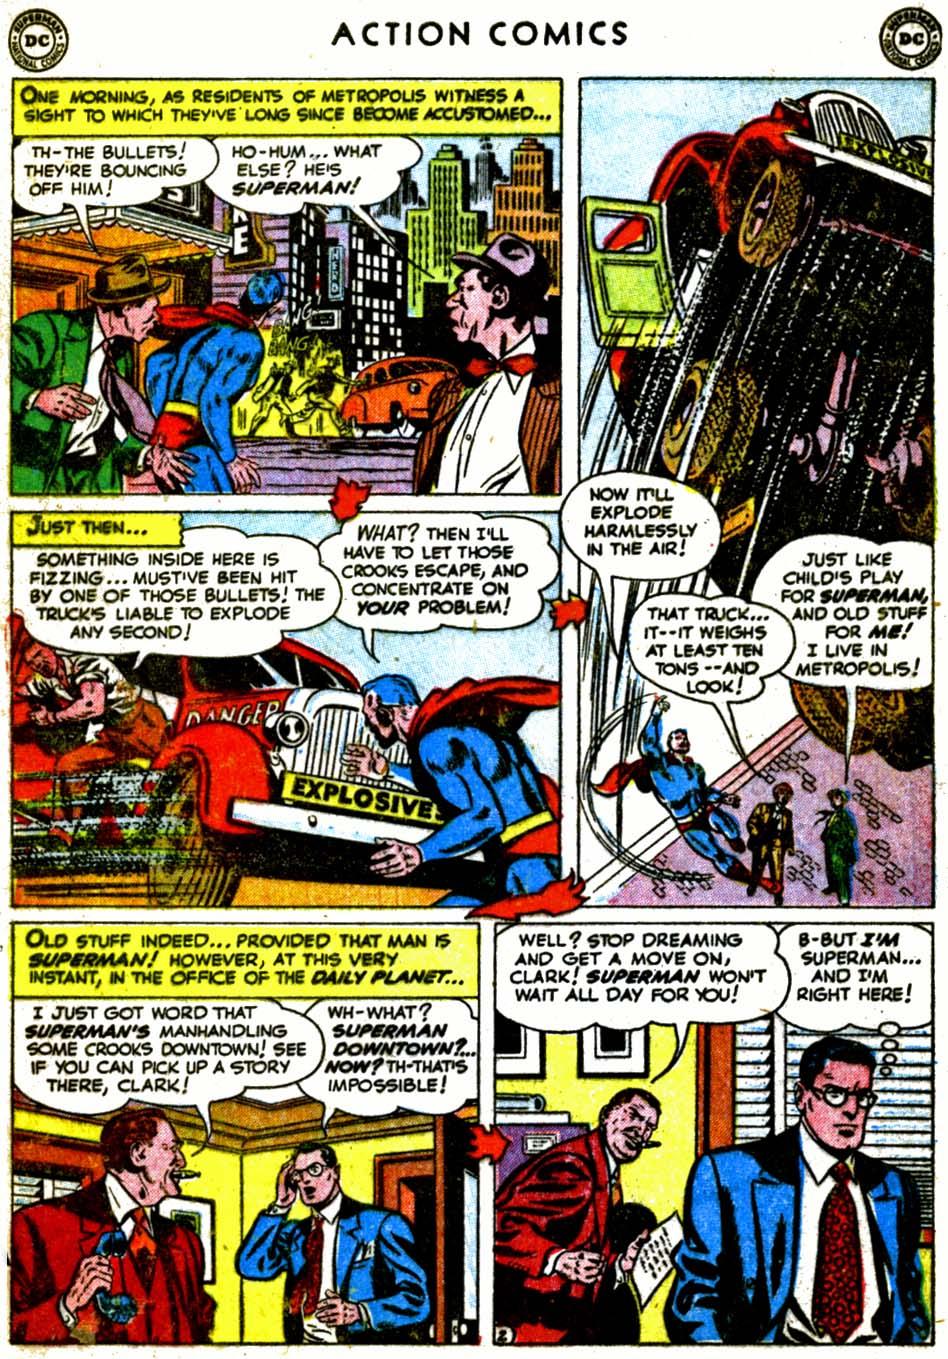 Action Comics (1938) 161 Page 3